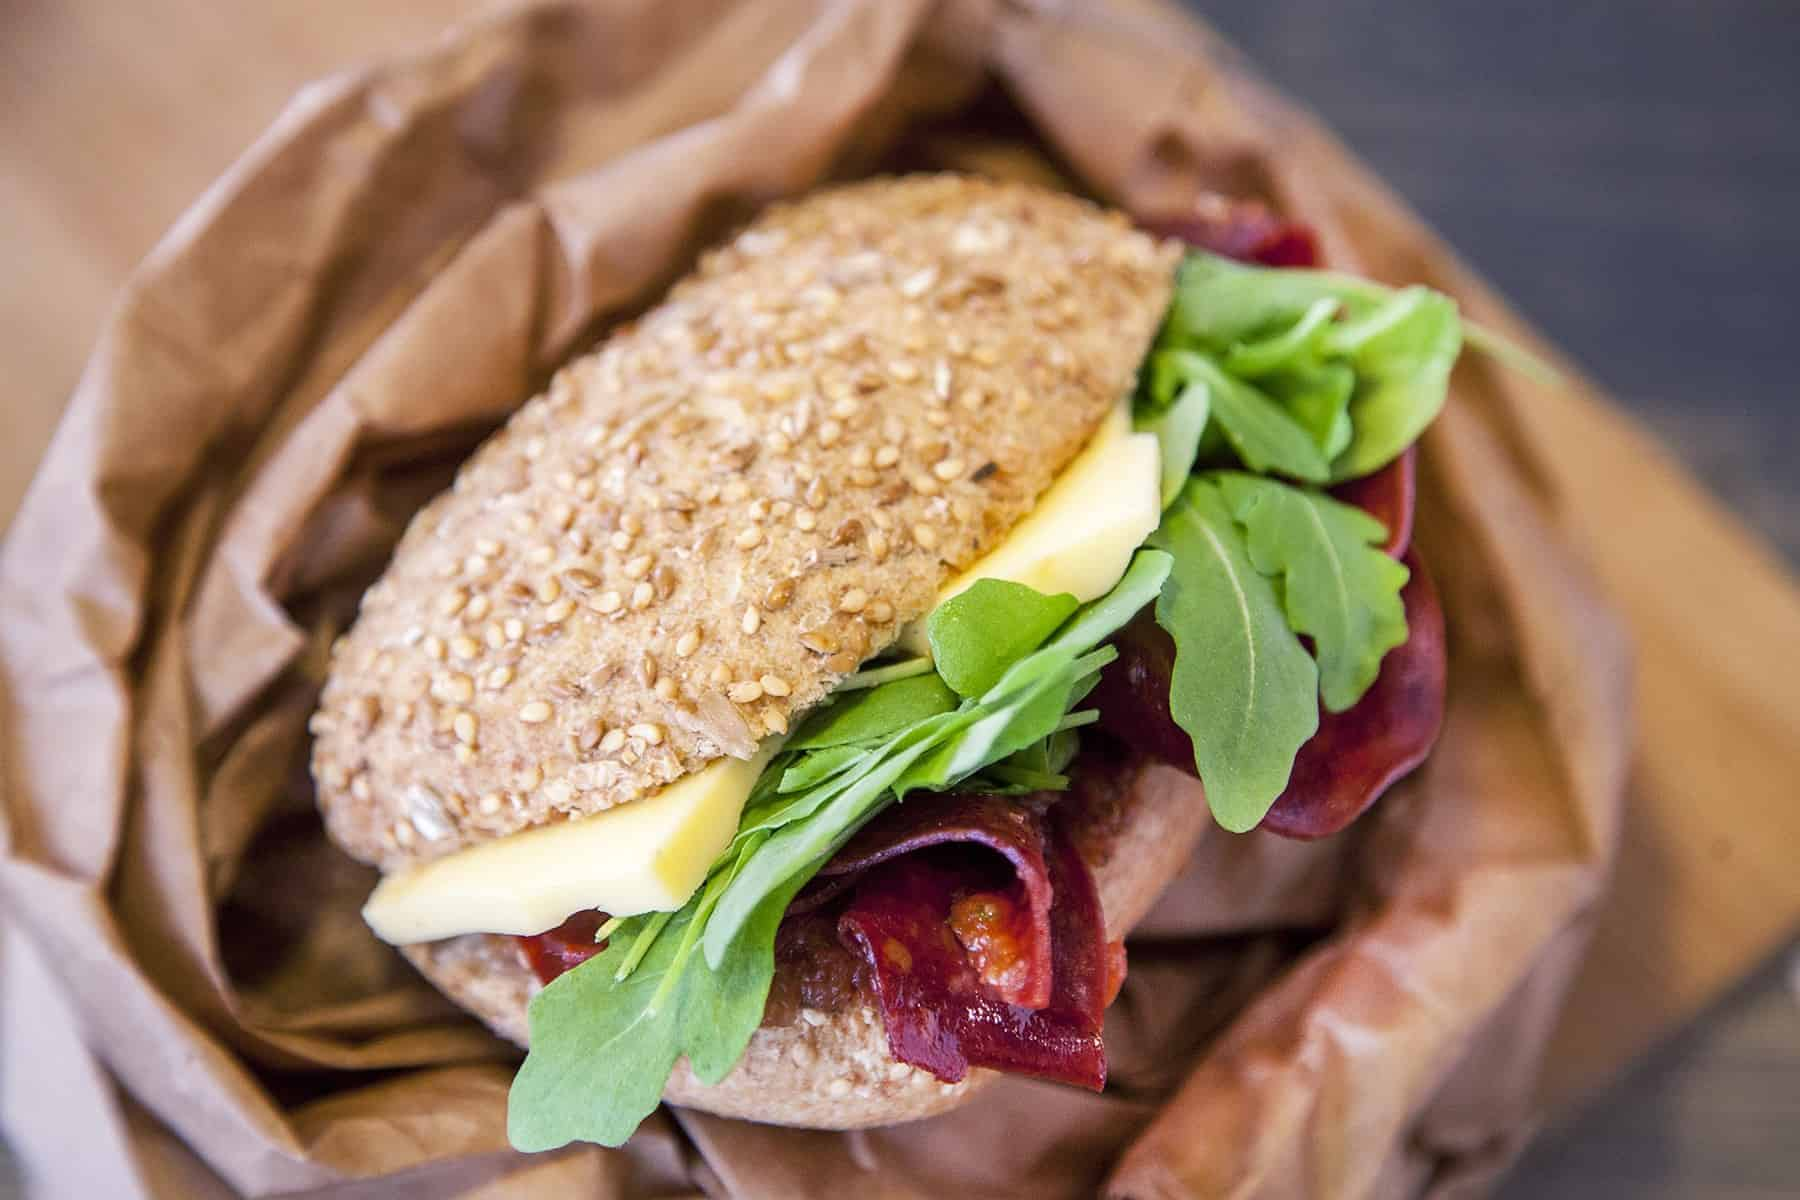 vegan-olasz-sultfelvagottas-szendvics-napfenyes-cukraszat